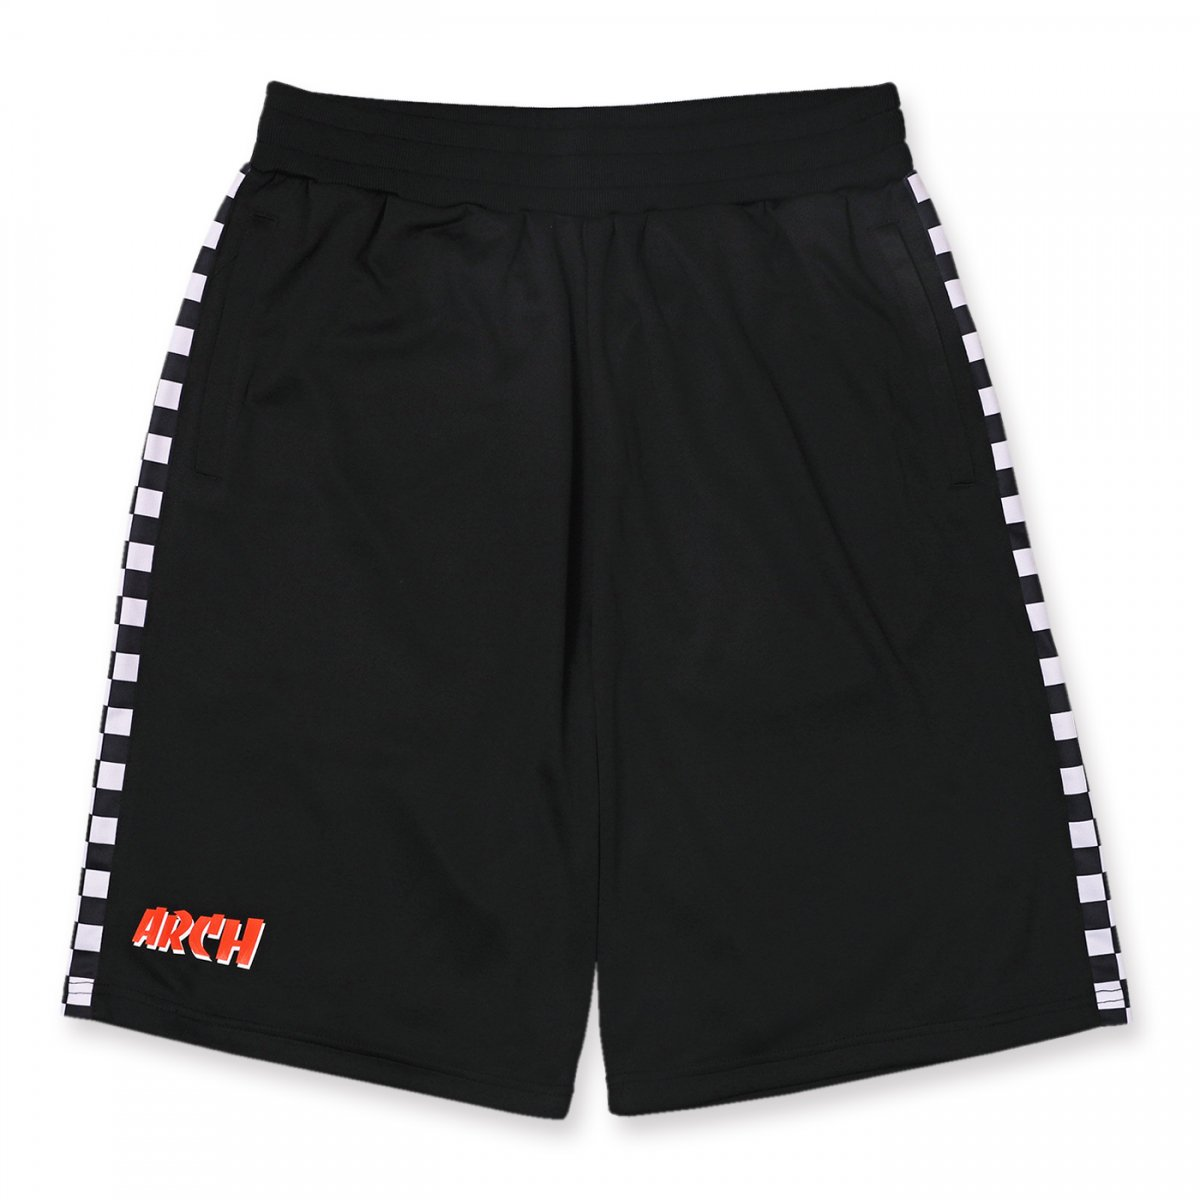 team checker shorts【black】